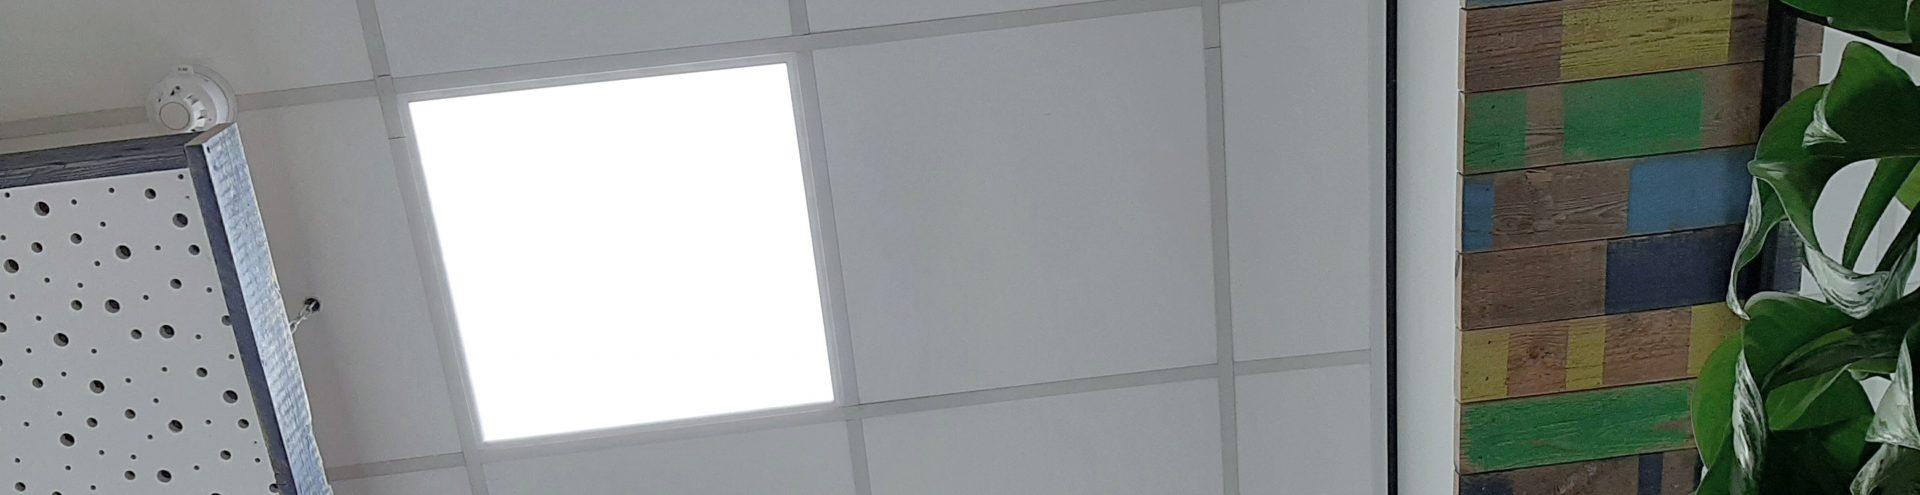 Refurbished plafondplaten - herbruikbare plafondplaten - hergebruik